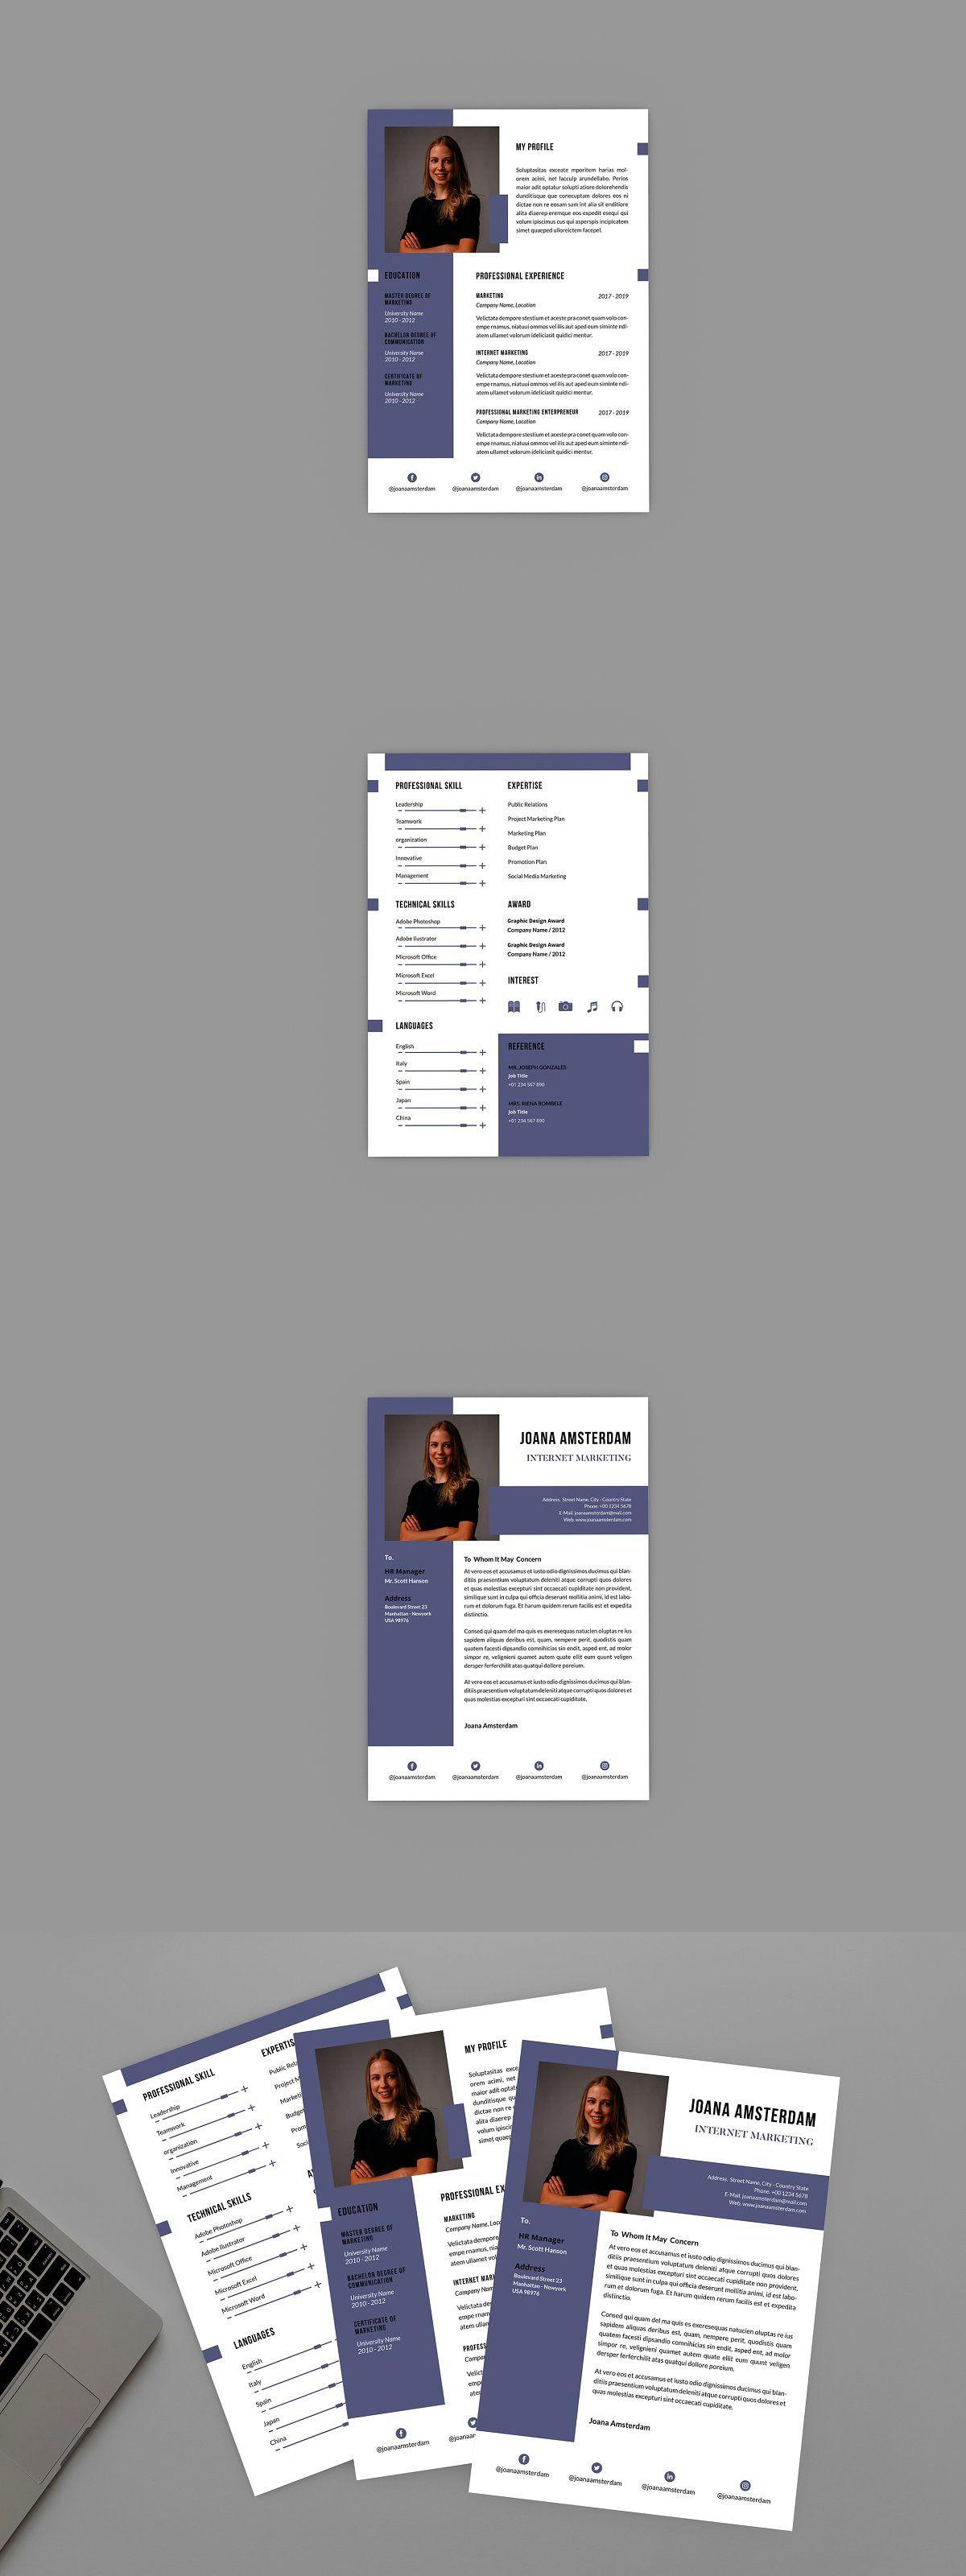 Alternatif Resume Designer Perfect resume, Templates, Resume